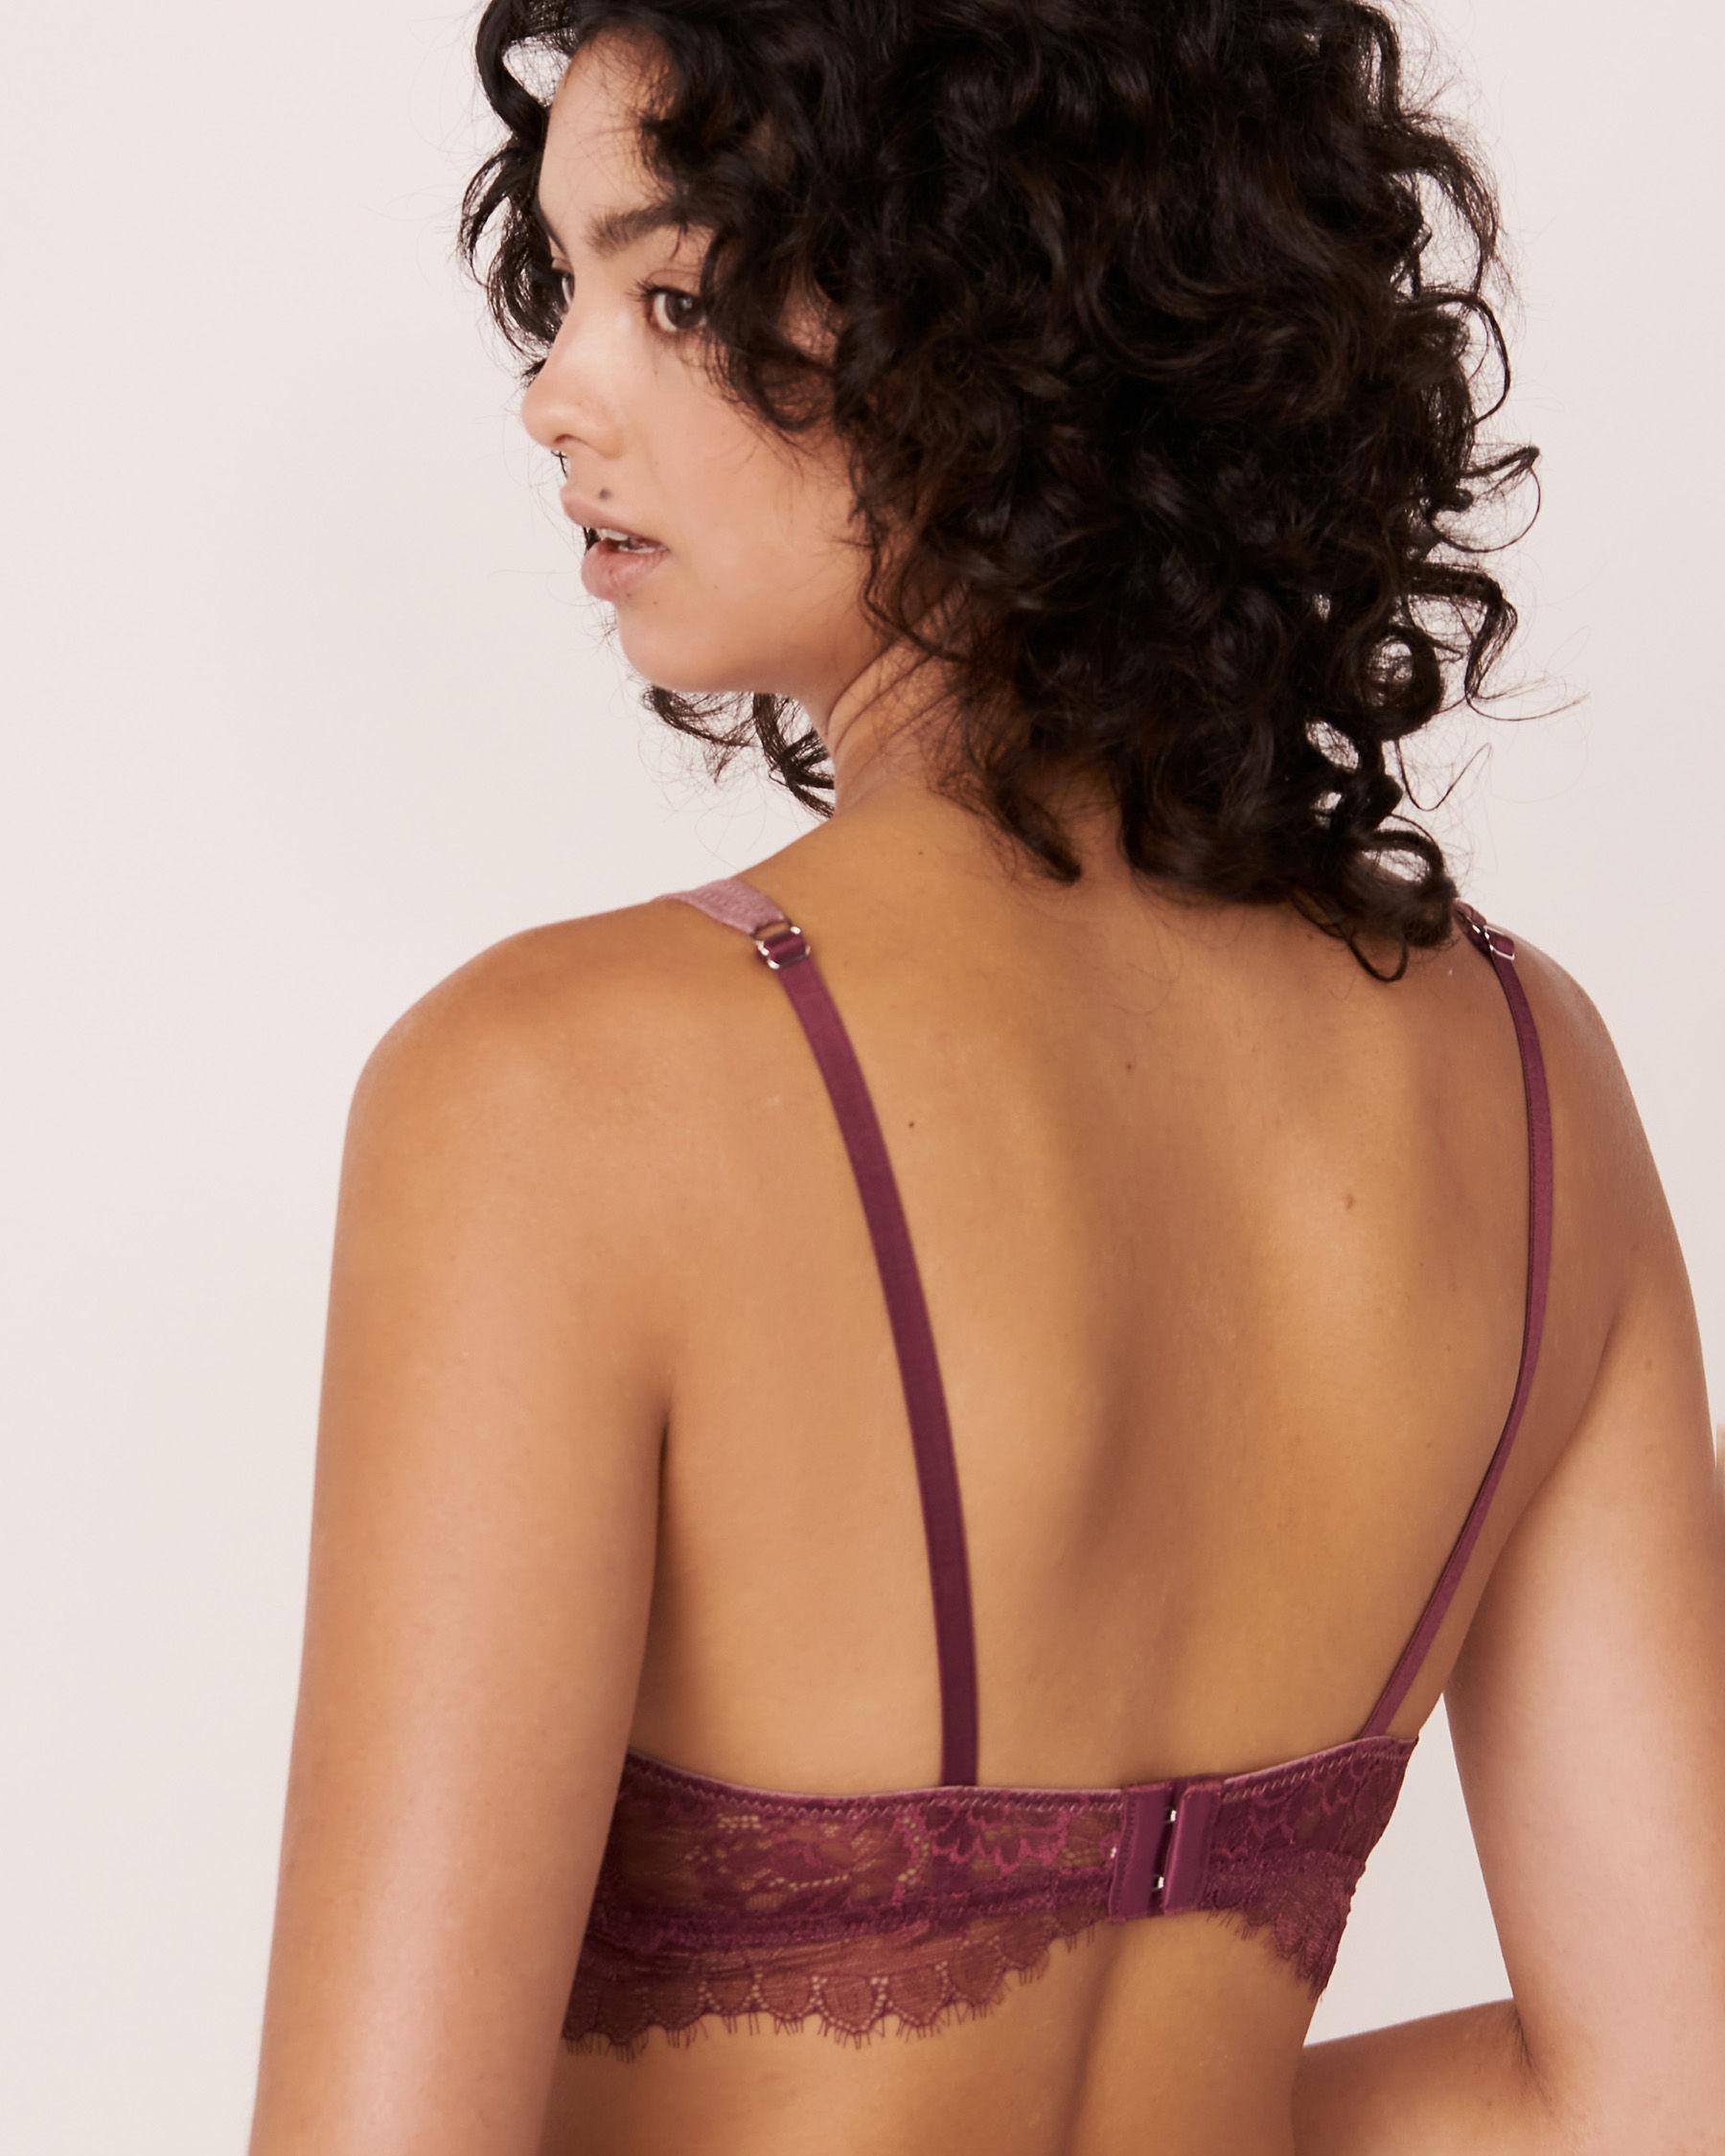 LA VIE EN ROSE Lace and Mesh Bralette Prune 10100030 - View2